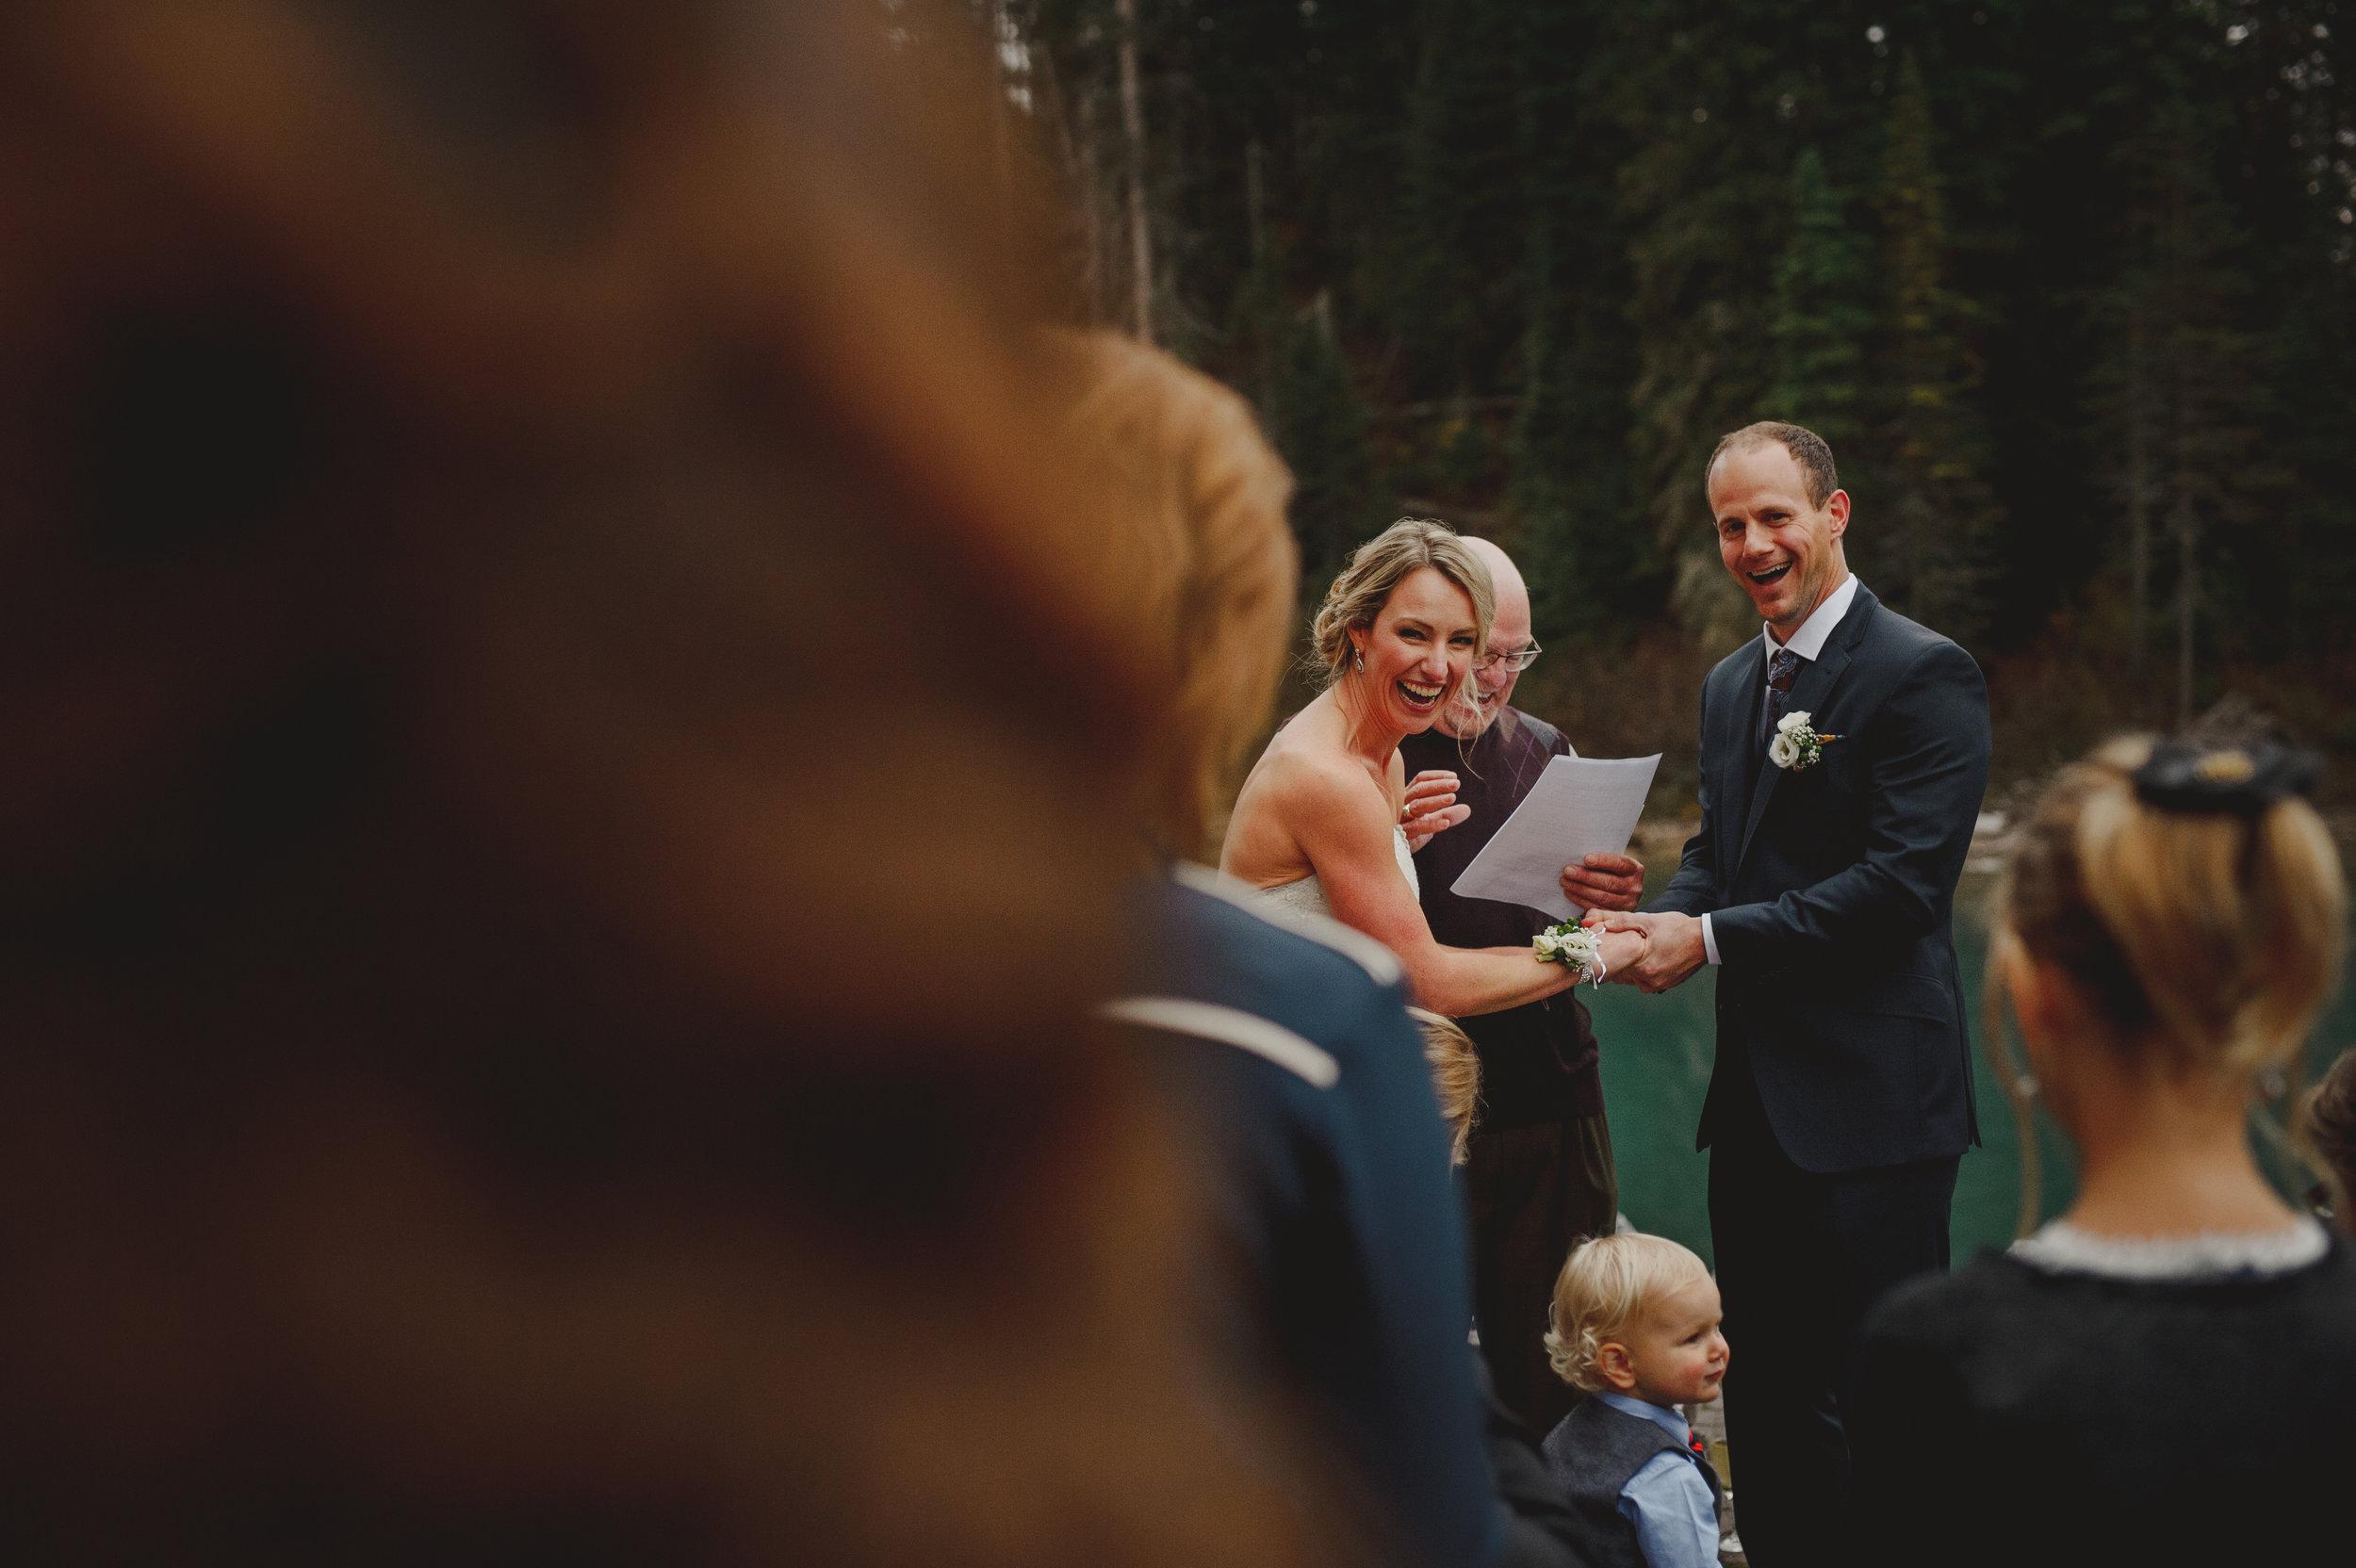 Banff-Wedding-Photographer-28.jpg